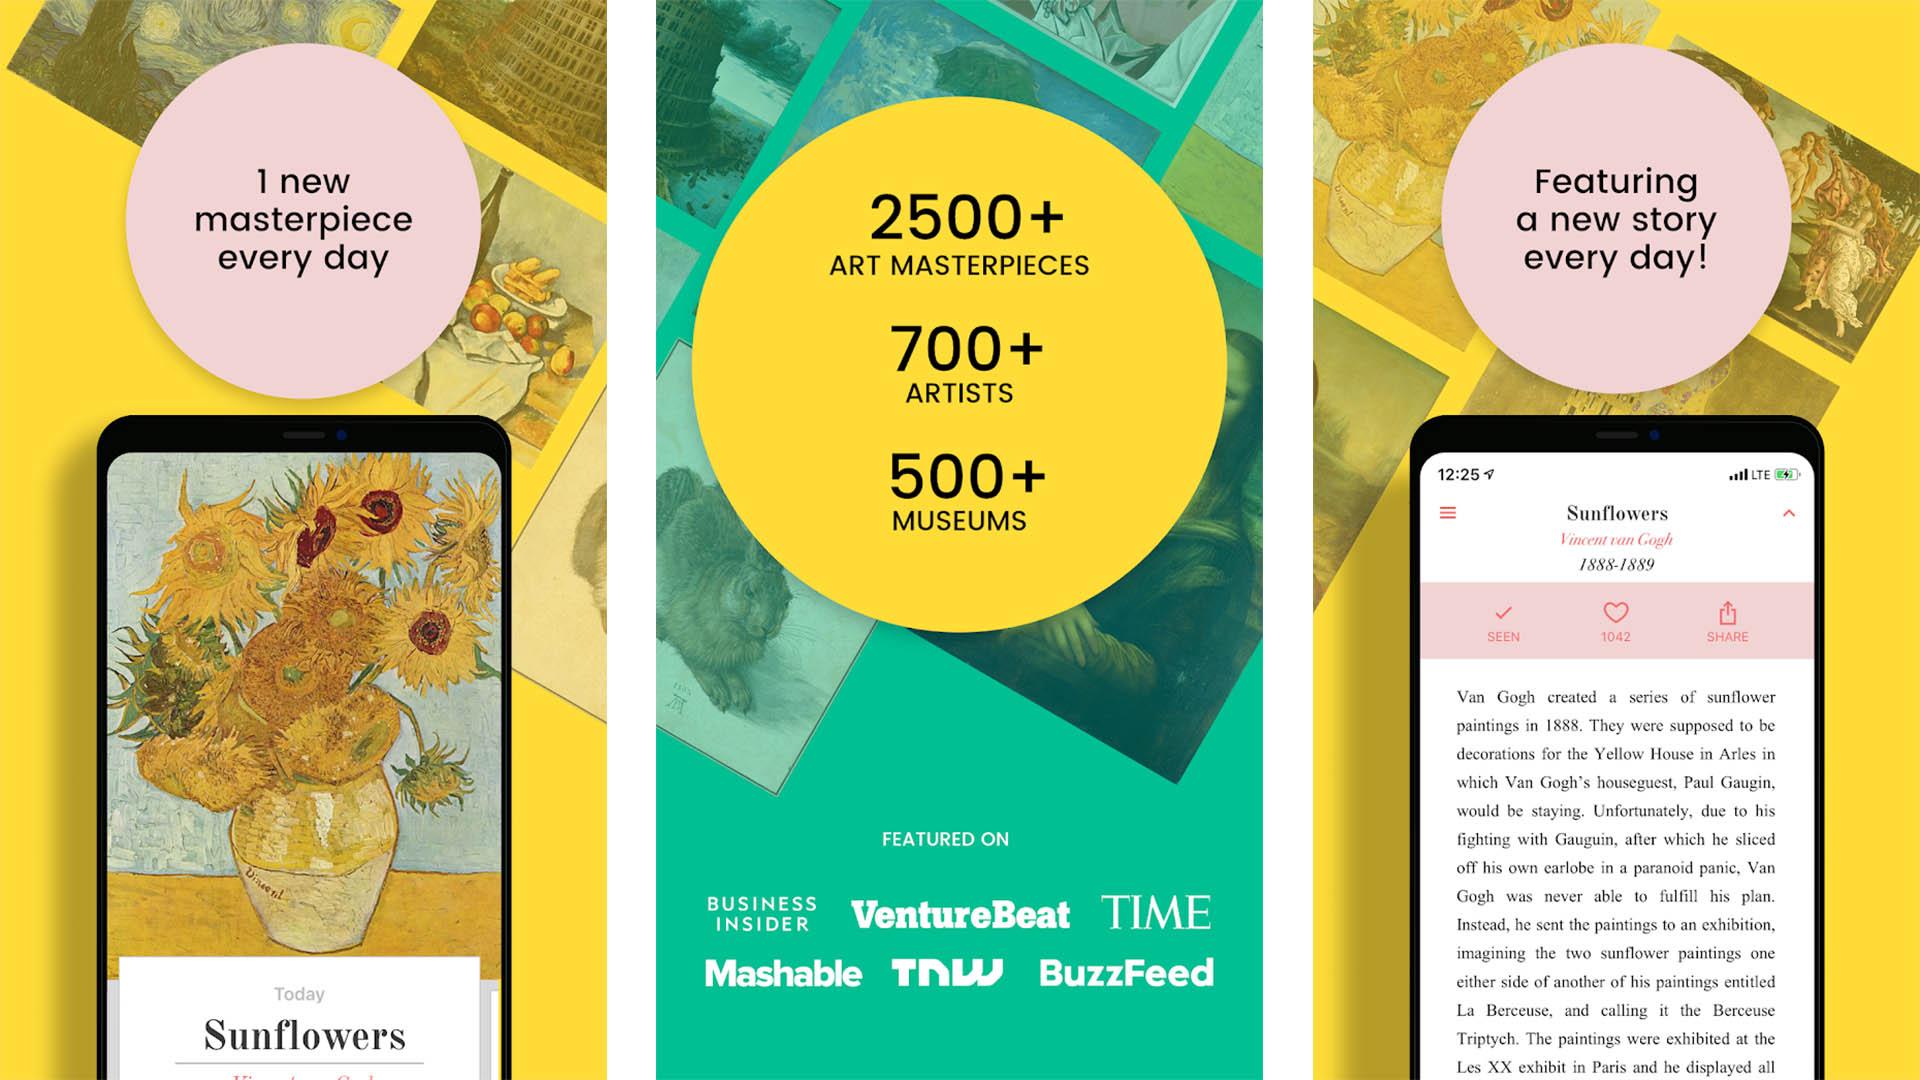 DailyArt screenshot 2020